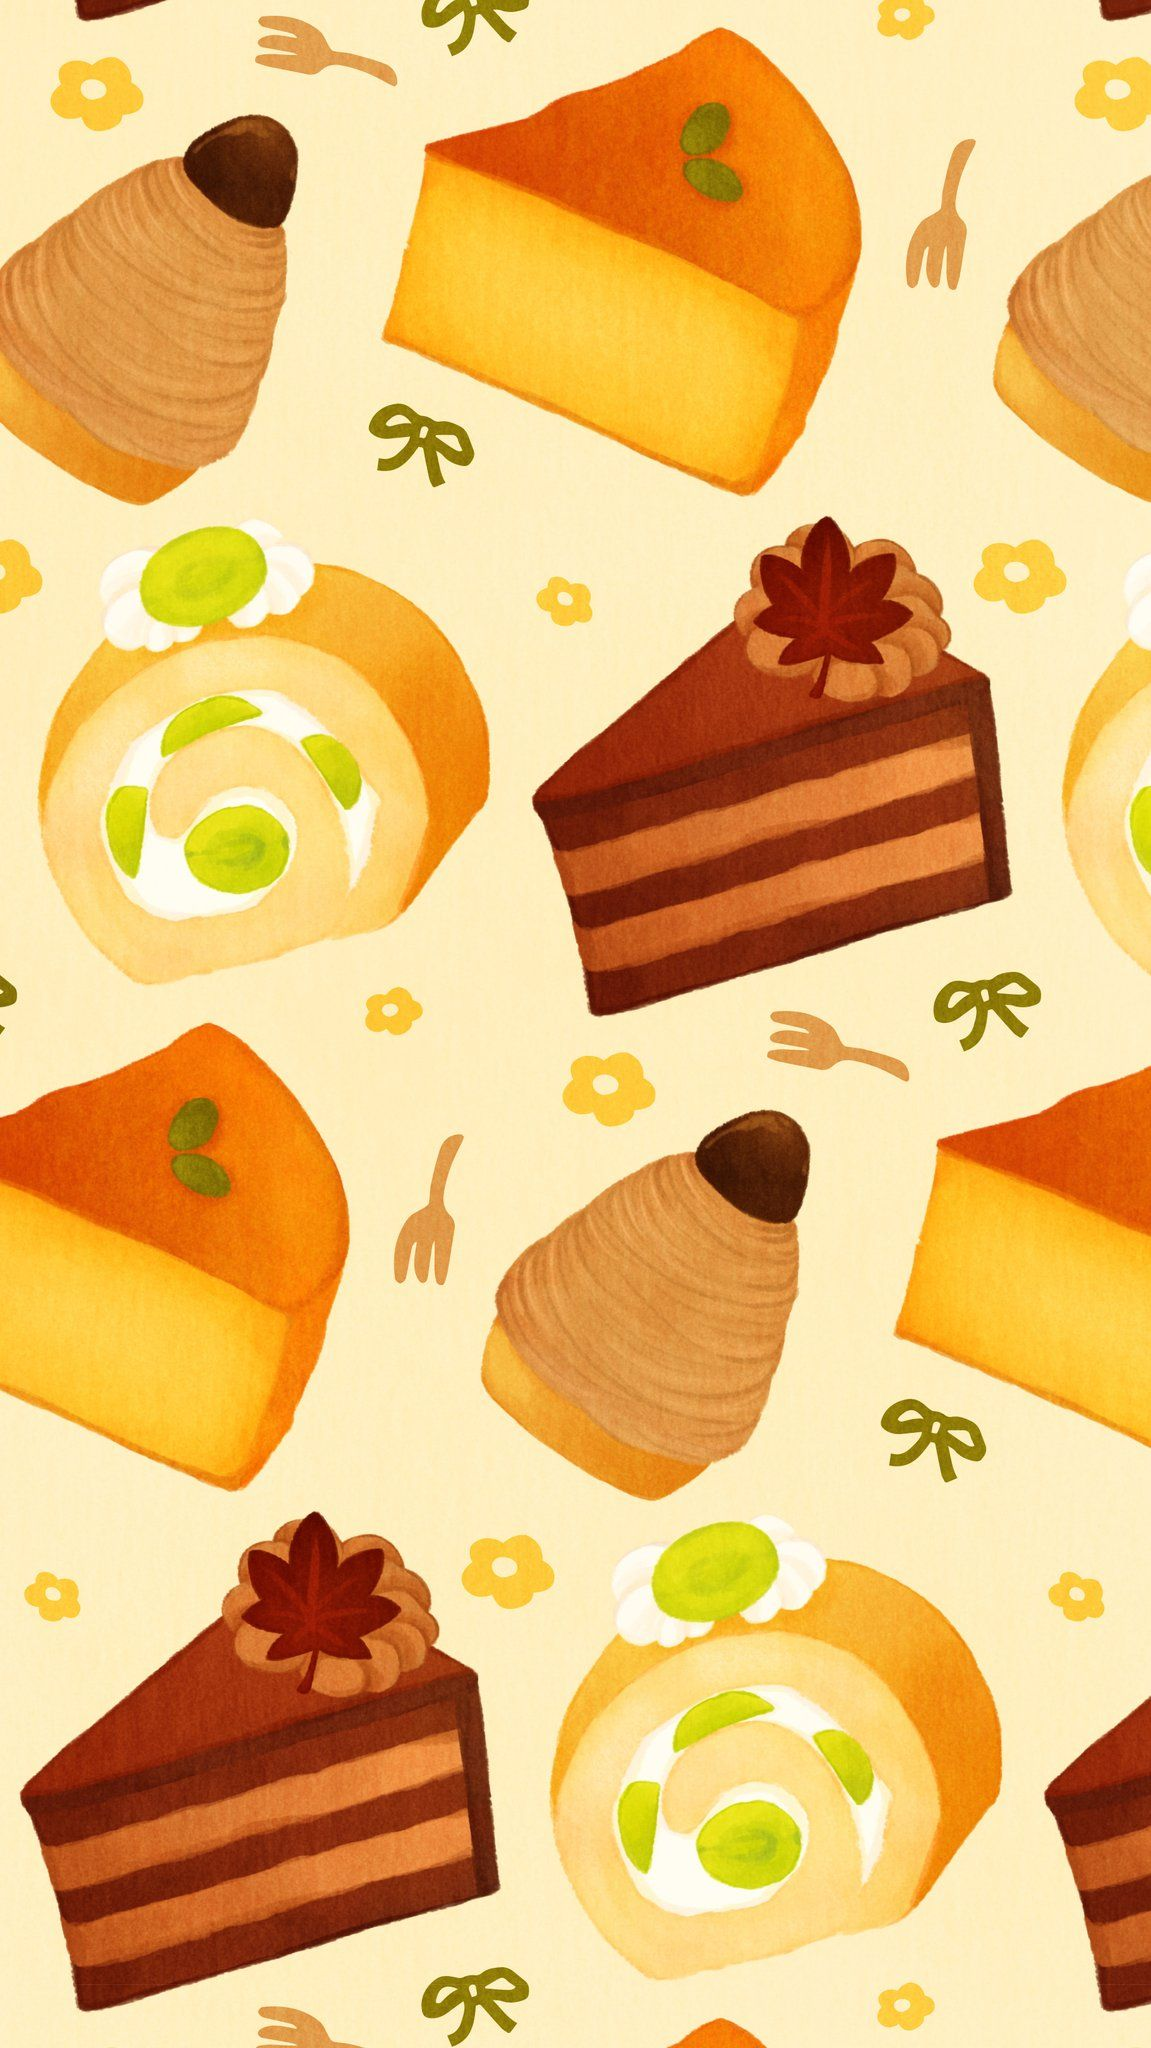 Omiyu みゆき On Twitter In 2020 Cake Wallpaper Kawaii Wallpaper Food Wallpaper